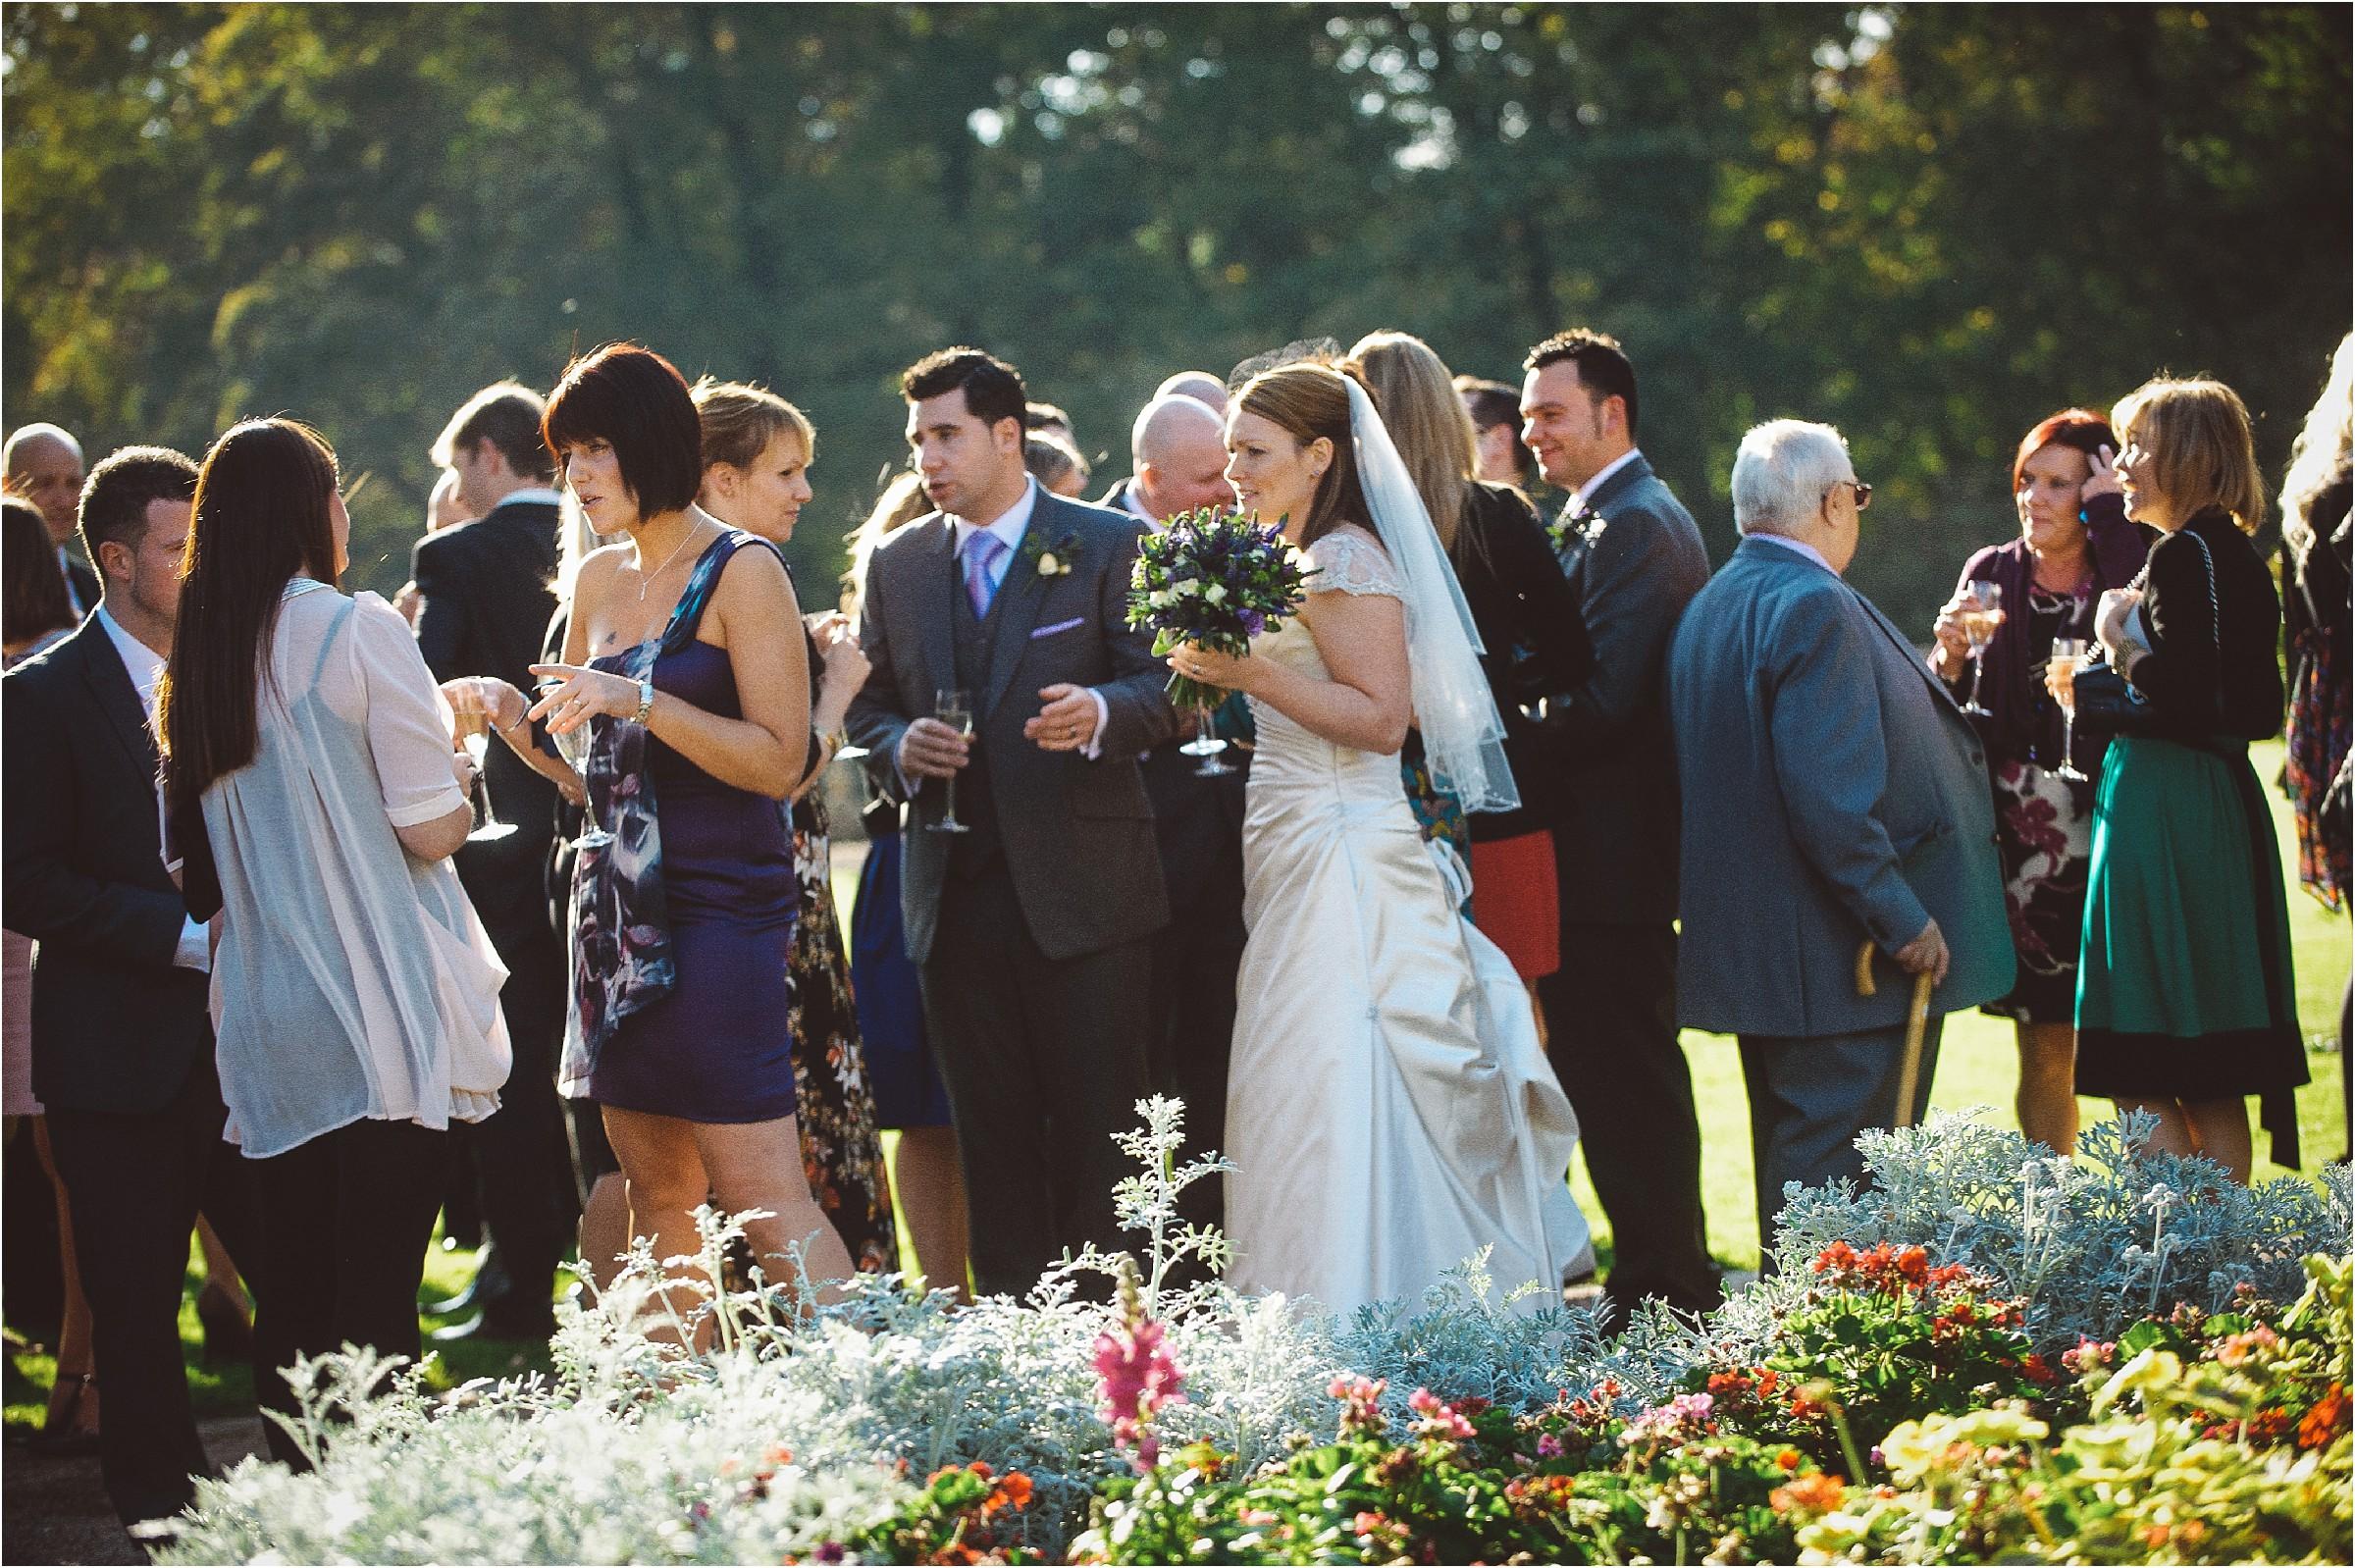 033 wedding photography doxford hall northumberlandDSC_0743e